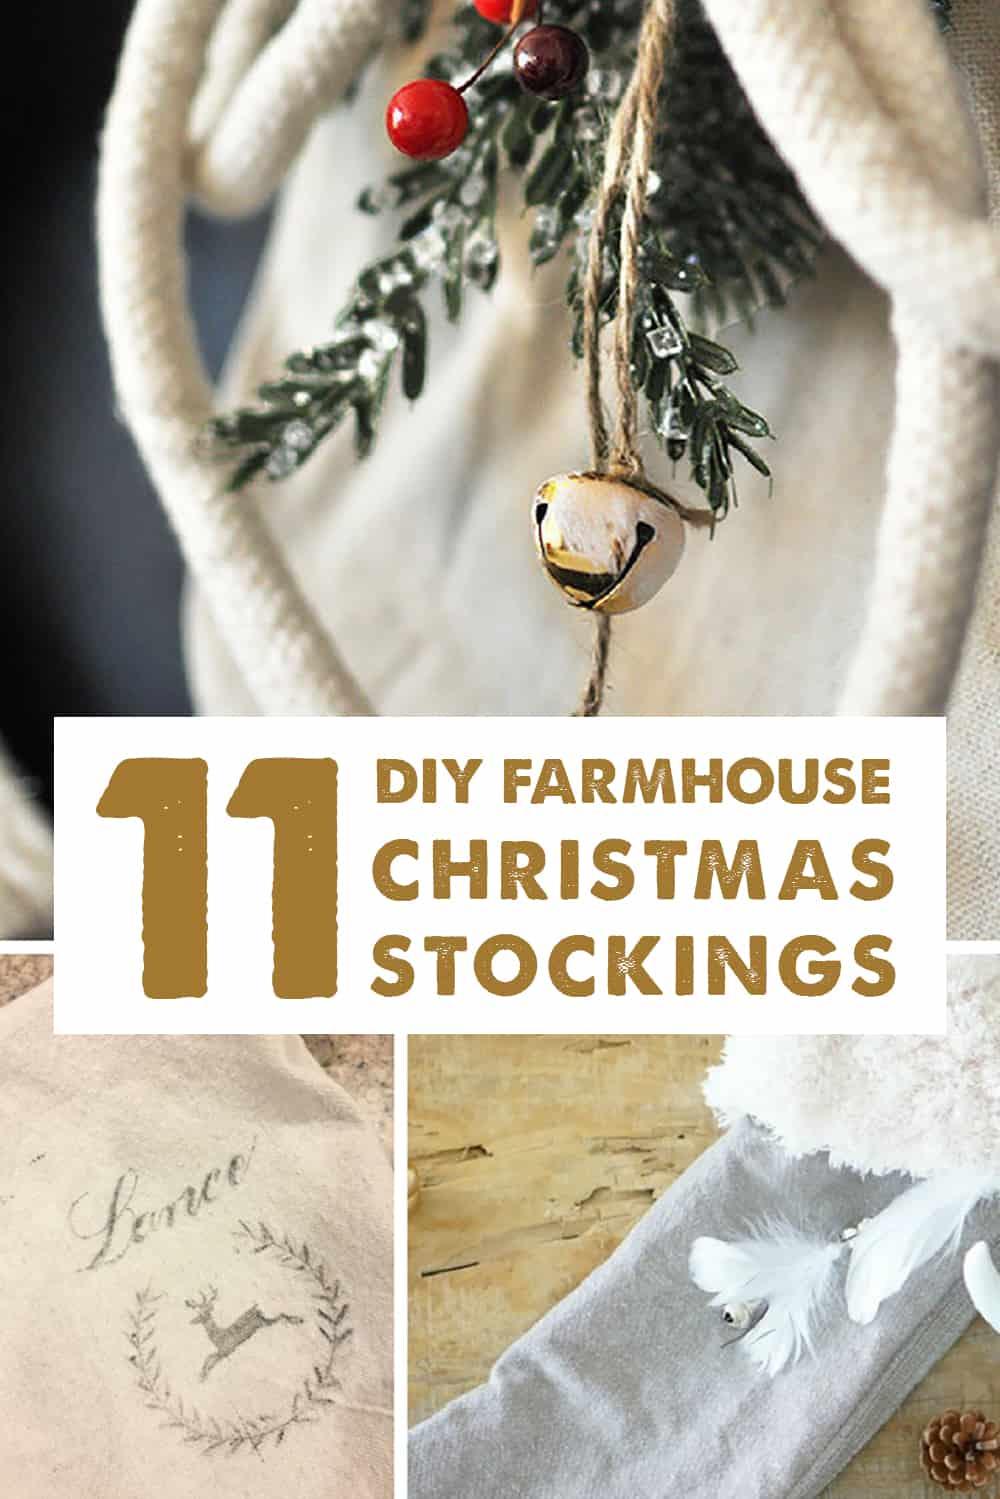 11 DIY Farmhouse Christmas Stockings